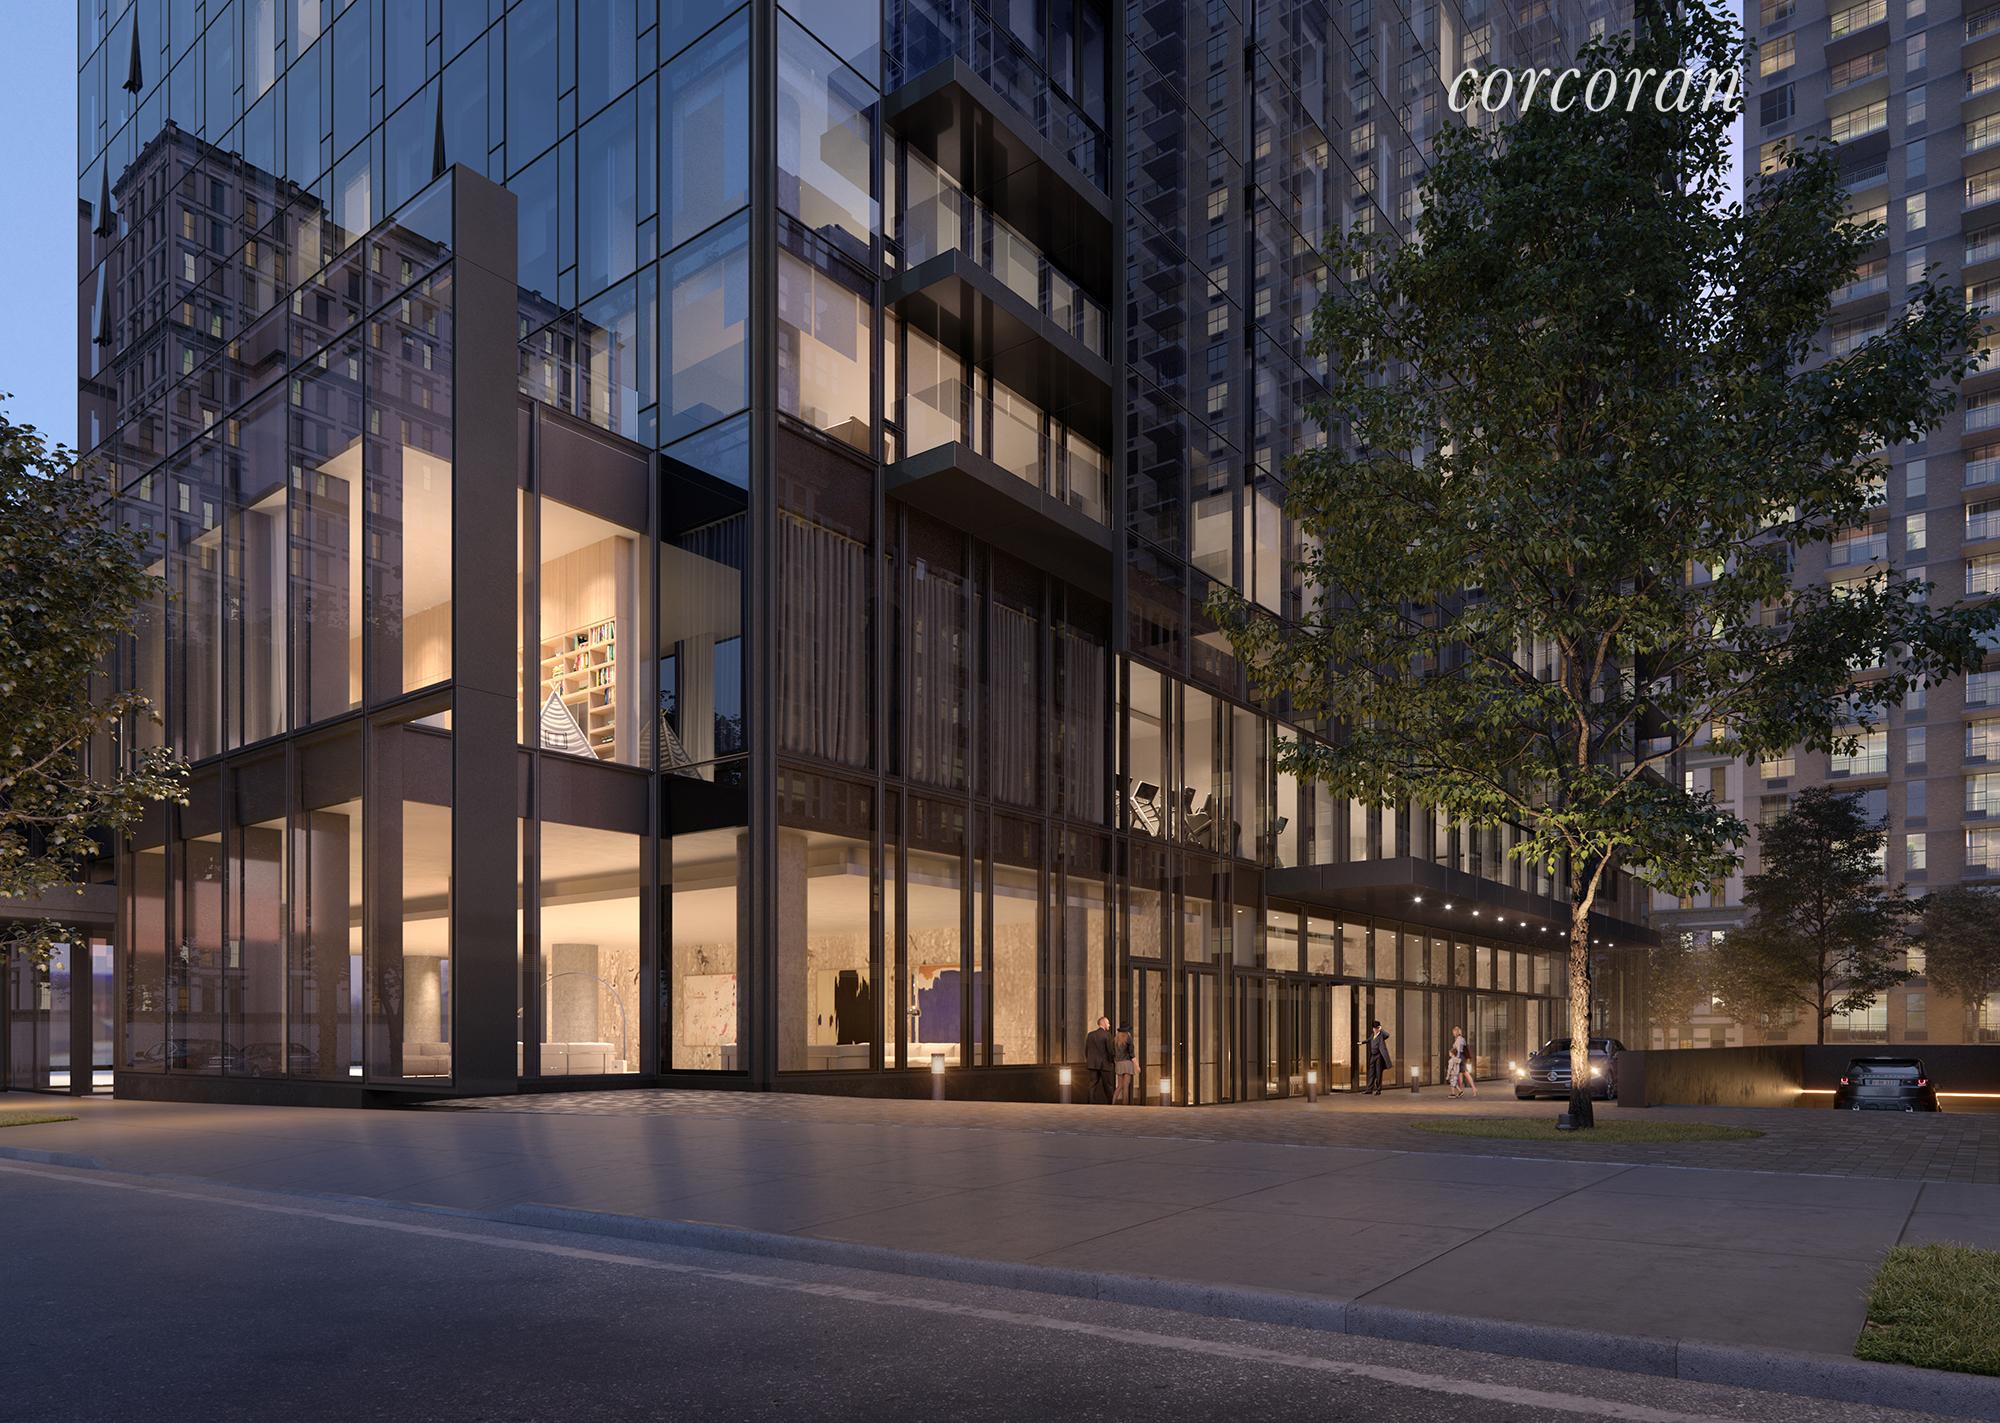 685 First Avenue, Apt 15-F, Manhattan, New York 10016